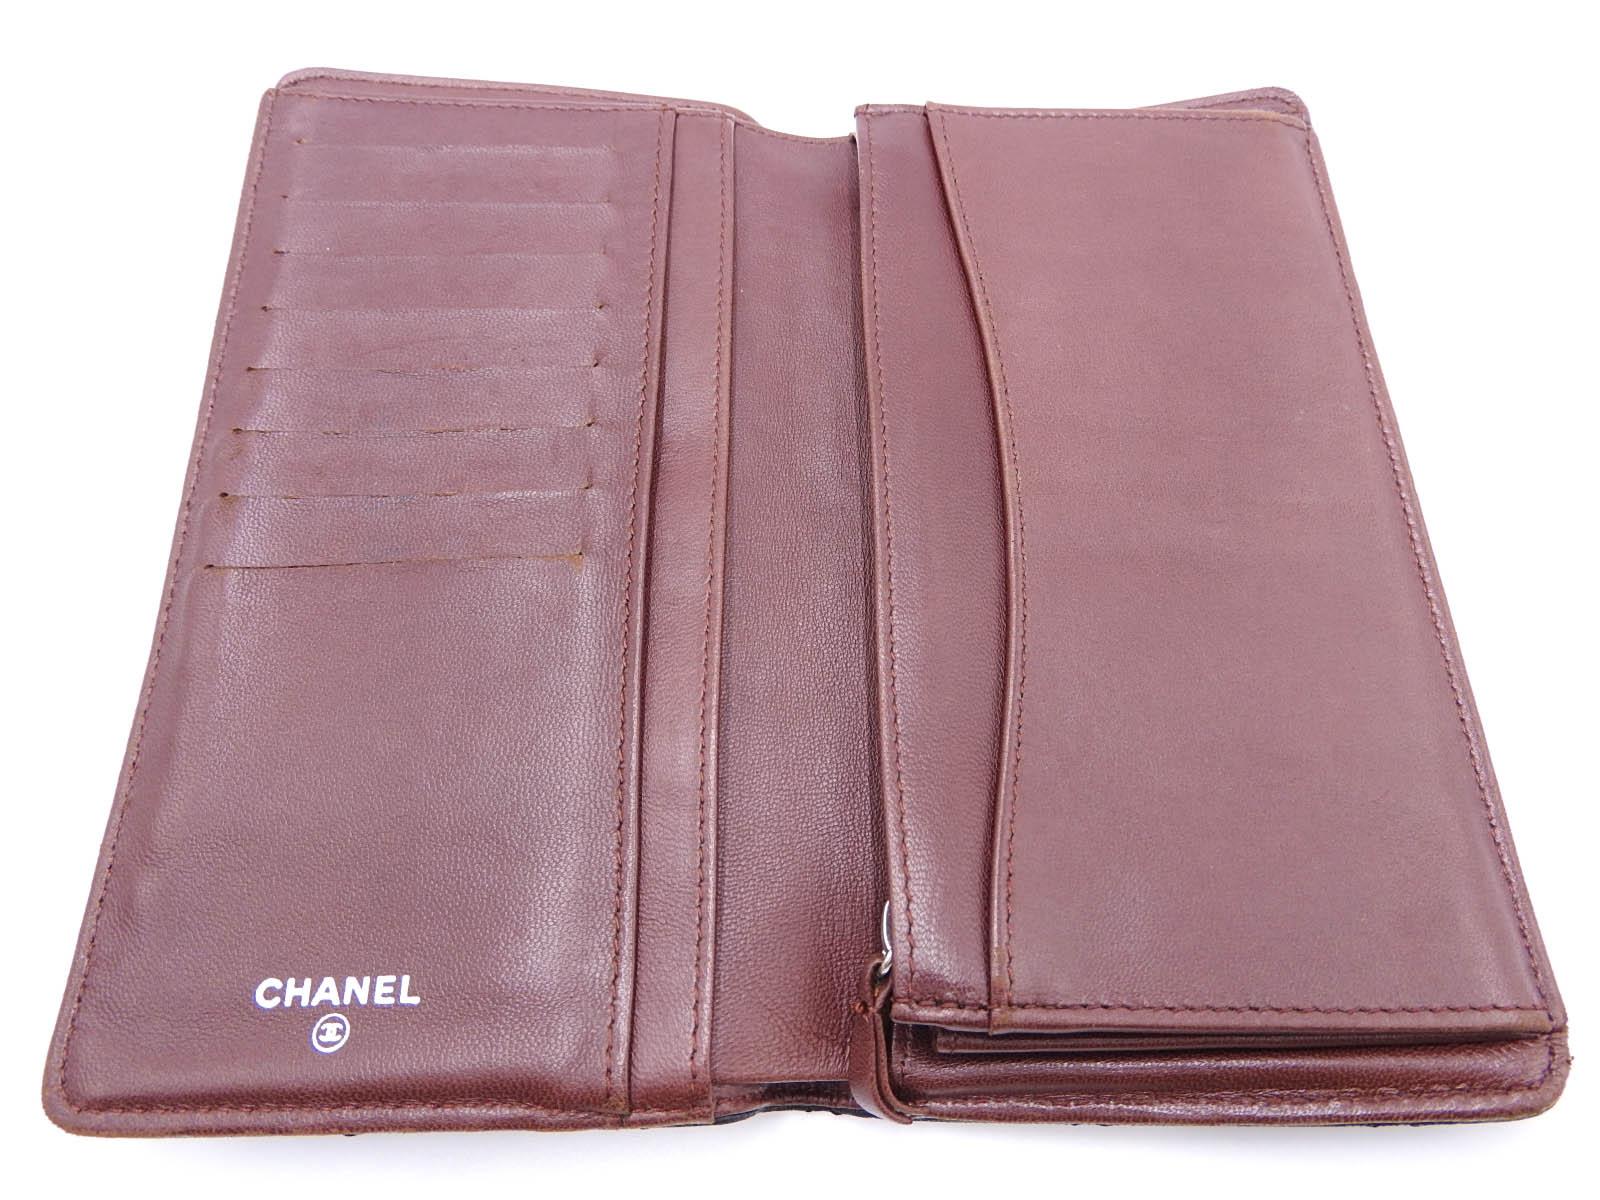 4494e7a1 Auth CHANEL CC Matelasse Bifold Long Wallet Lambskin Black Silver A31509  A-9381